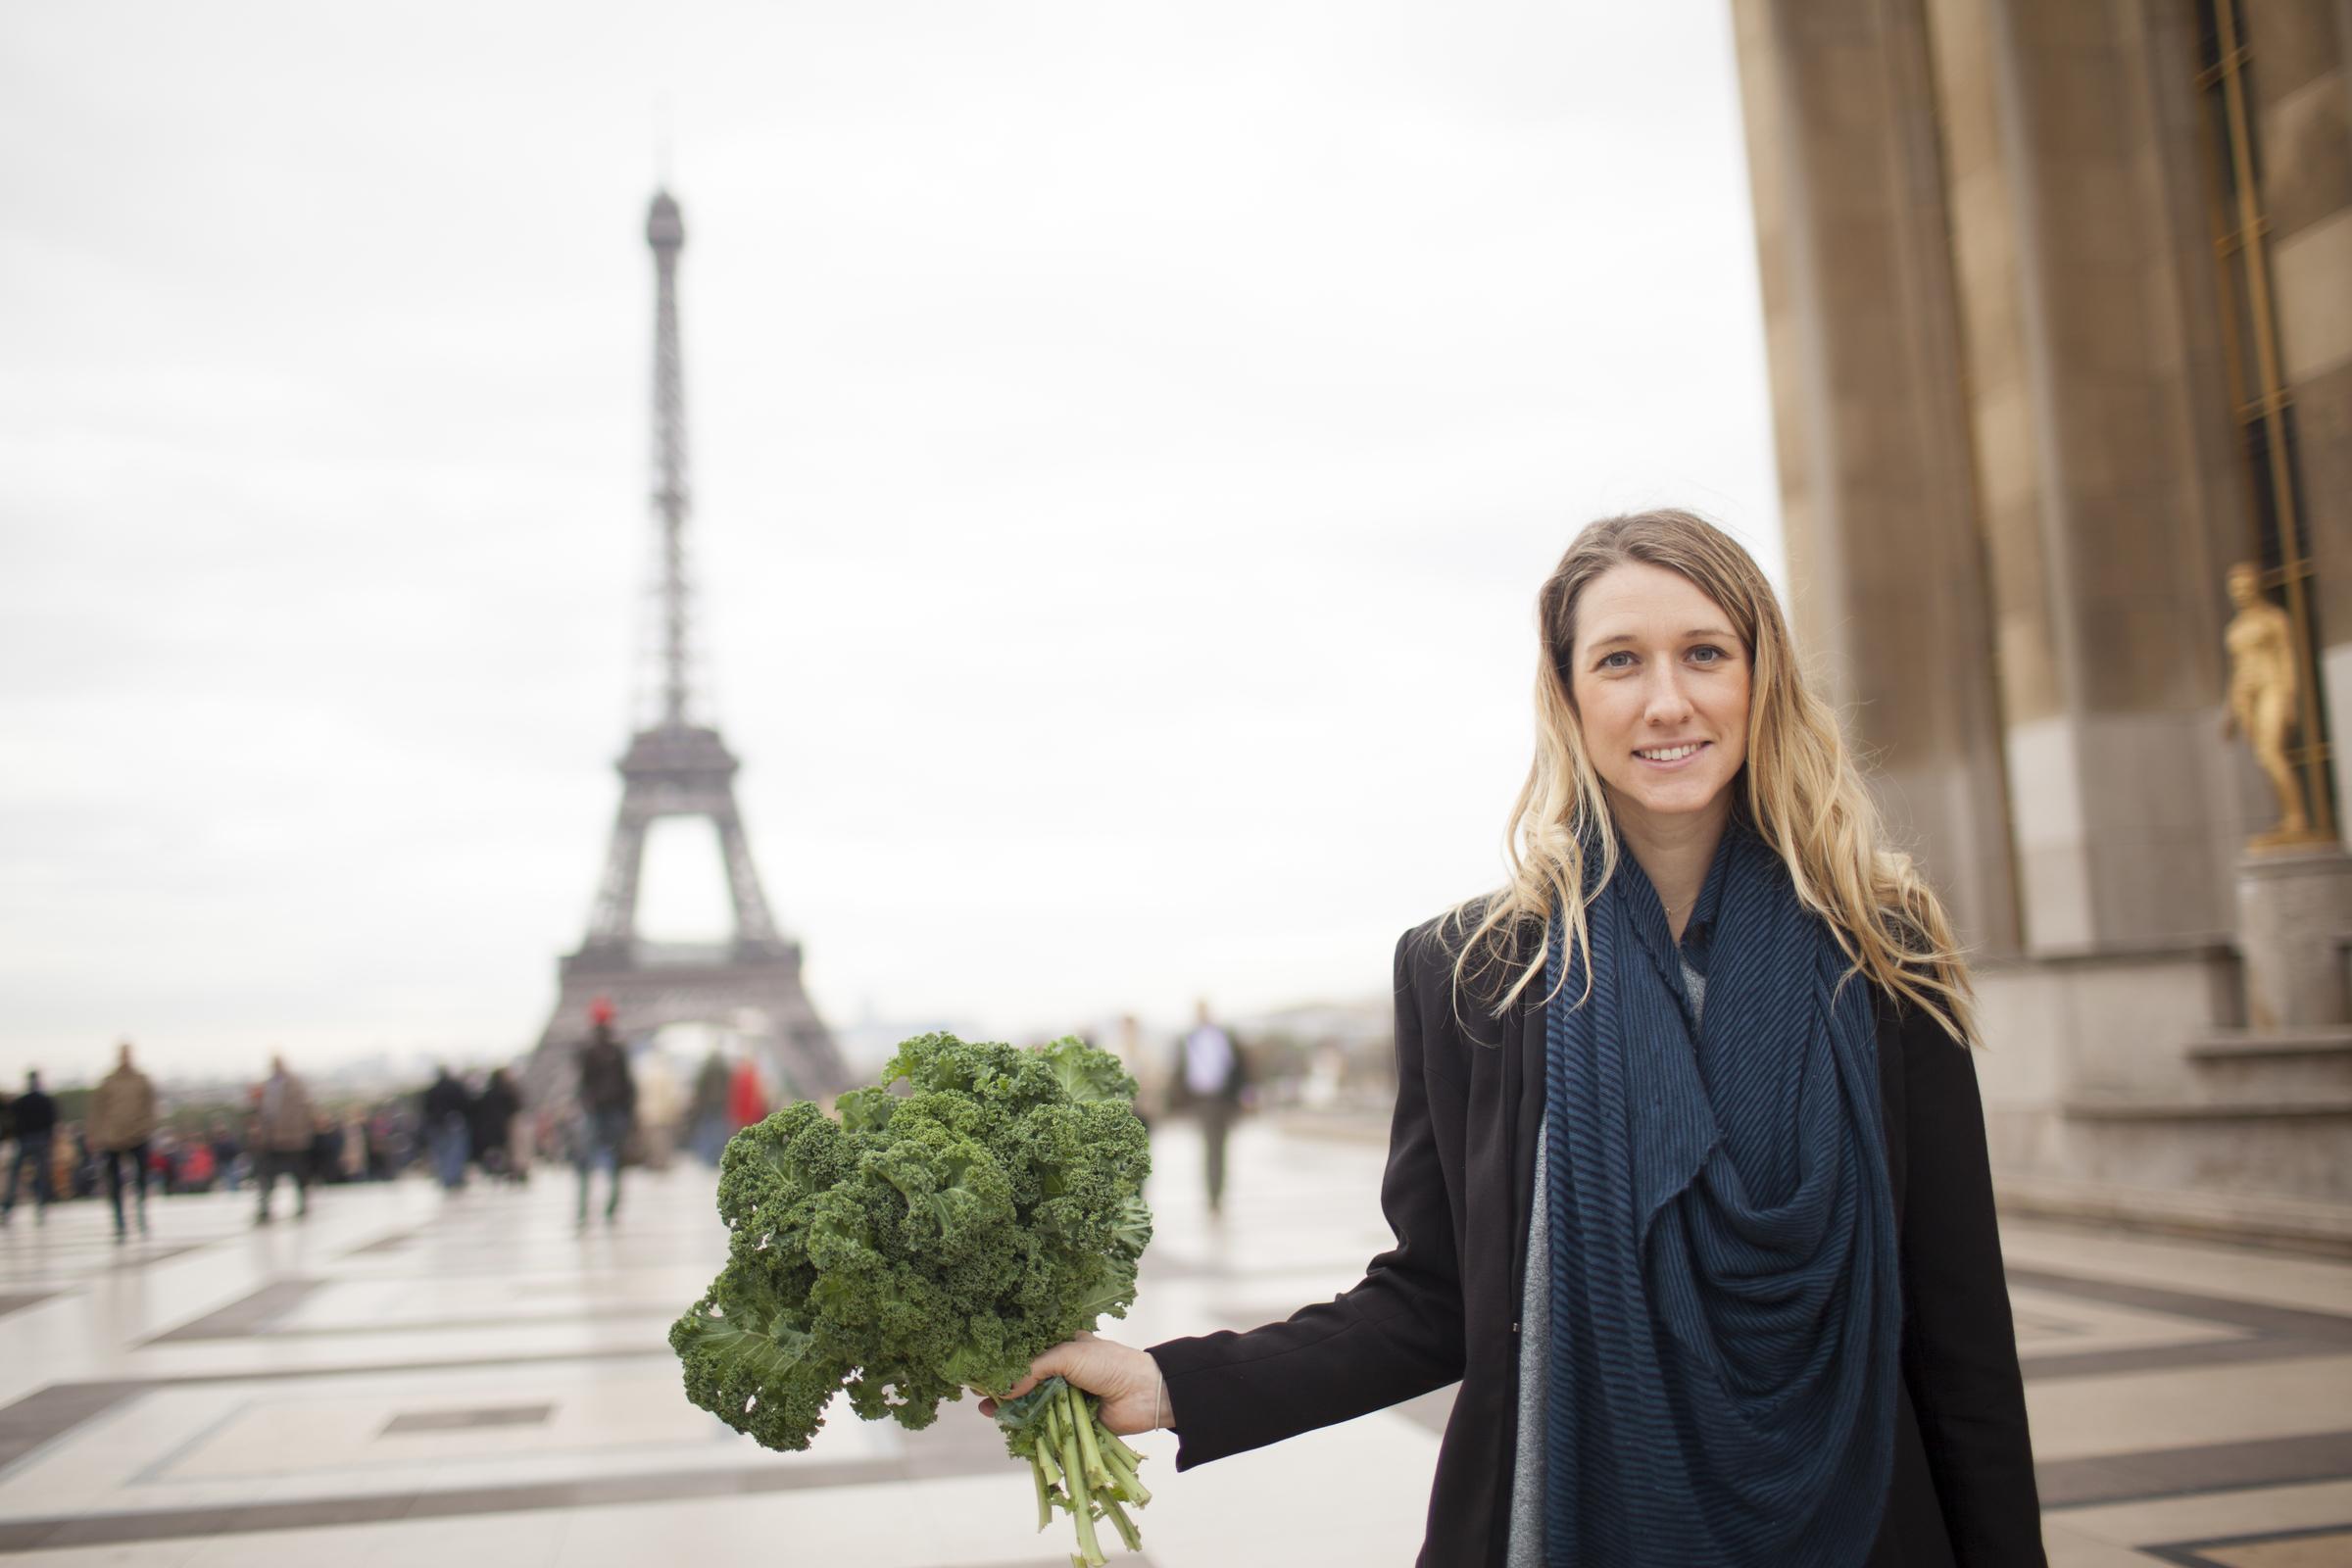 Kristen Beddard with kale